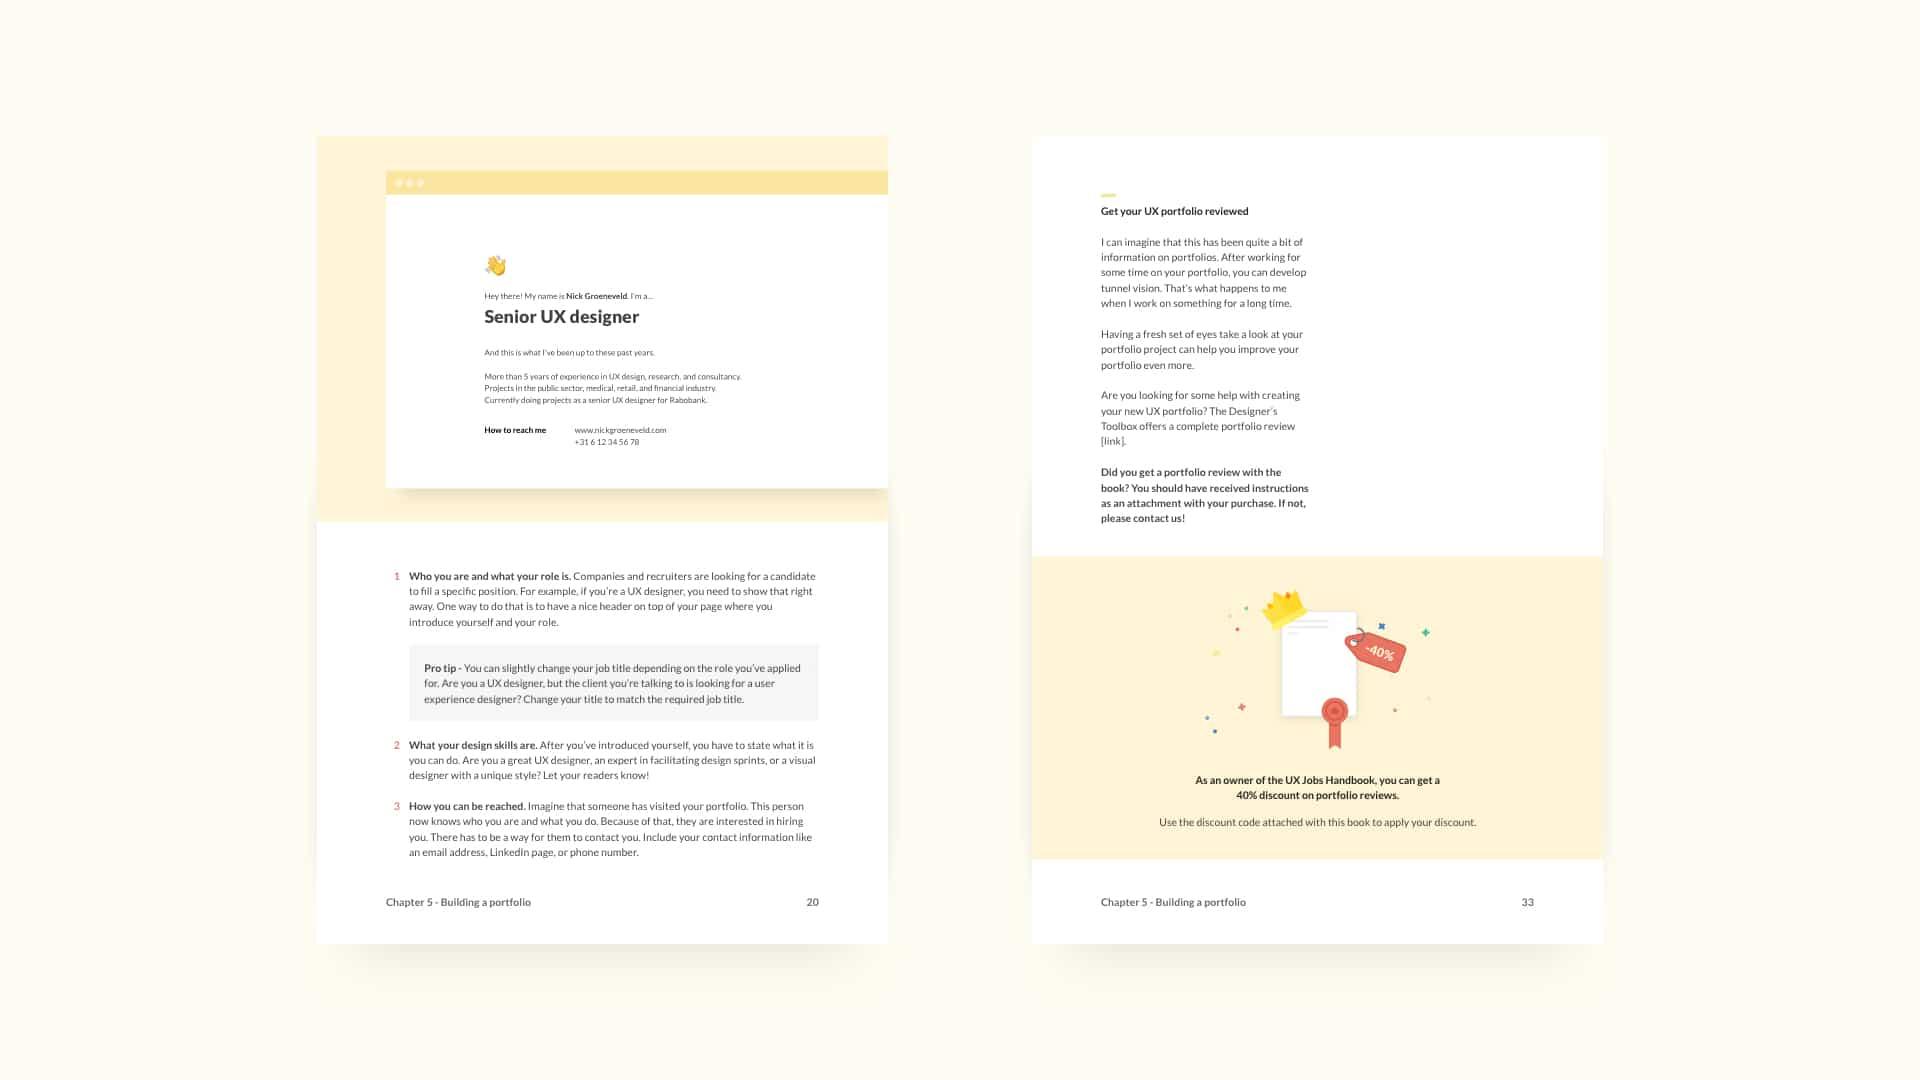 UX Jobs Handbook Overview Slide Three